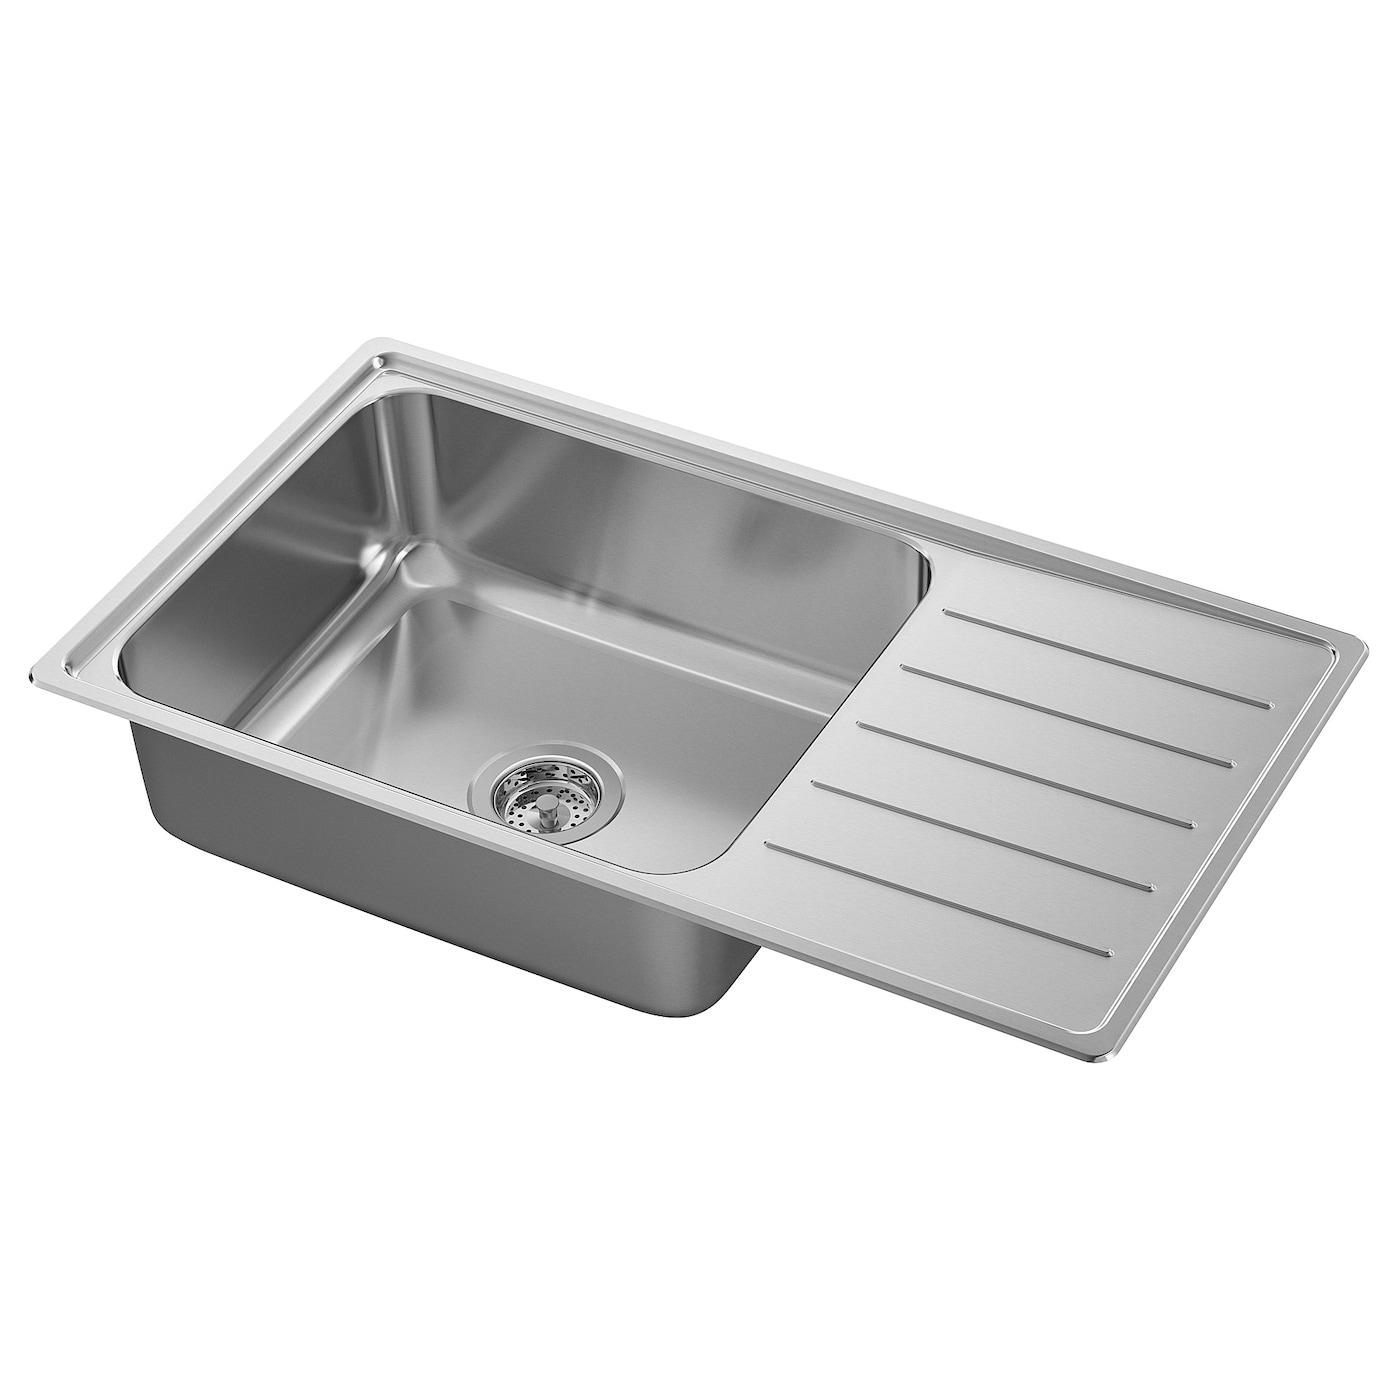 Ikea Vattudalen Einbauspule 1 Becken Abtropfflache Edelstahl Moebel Suchmaschine Ladendirekt De